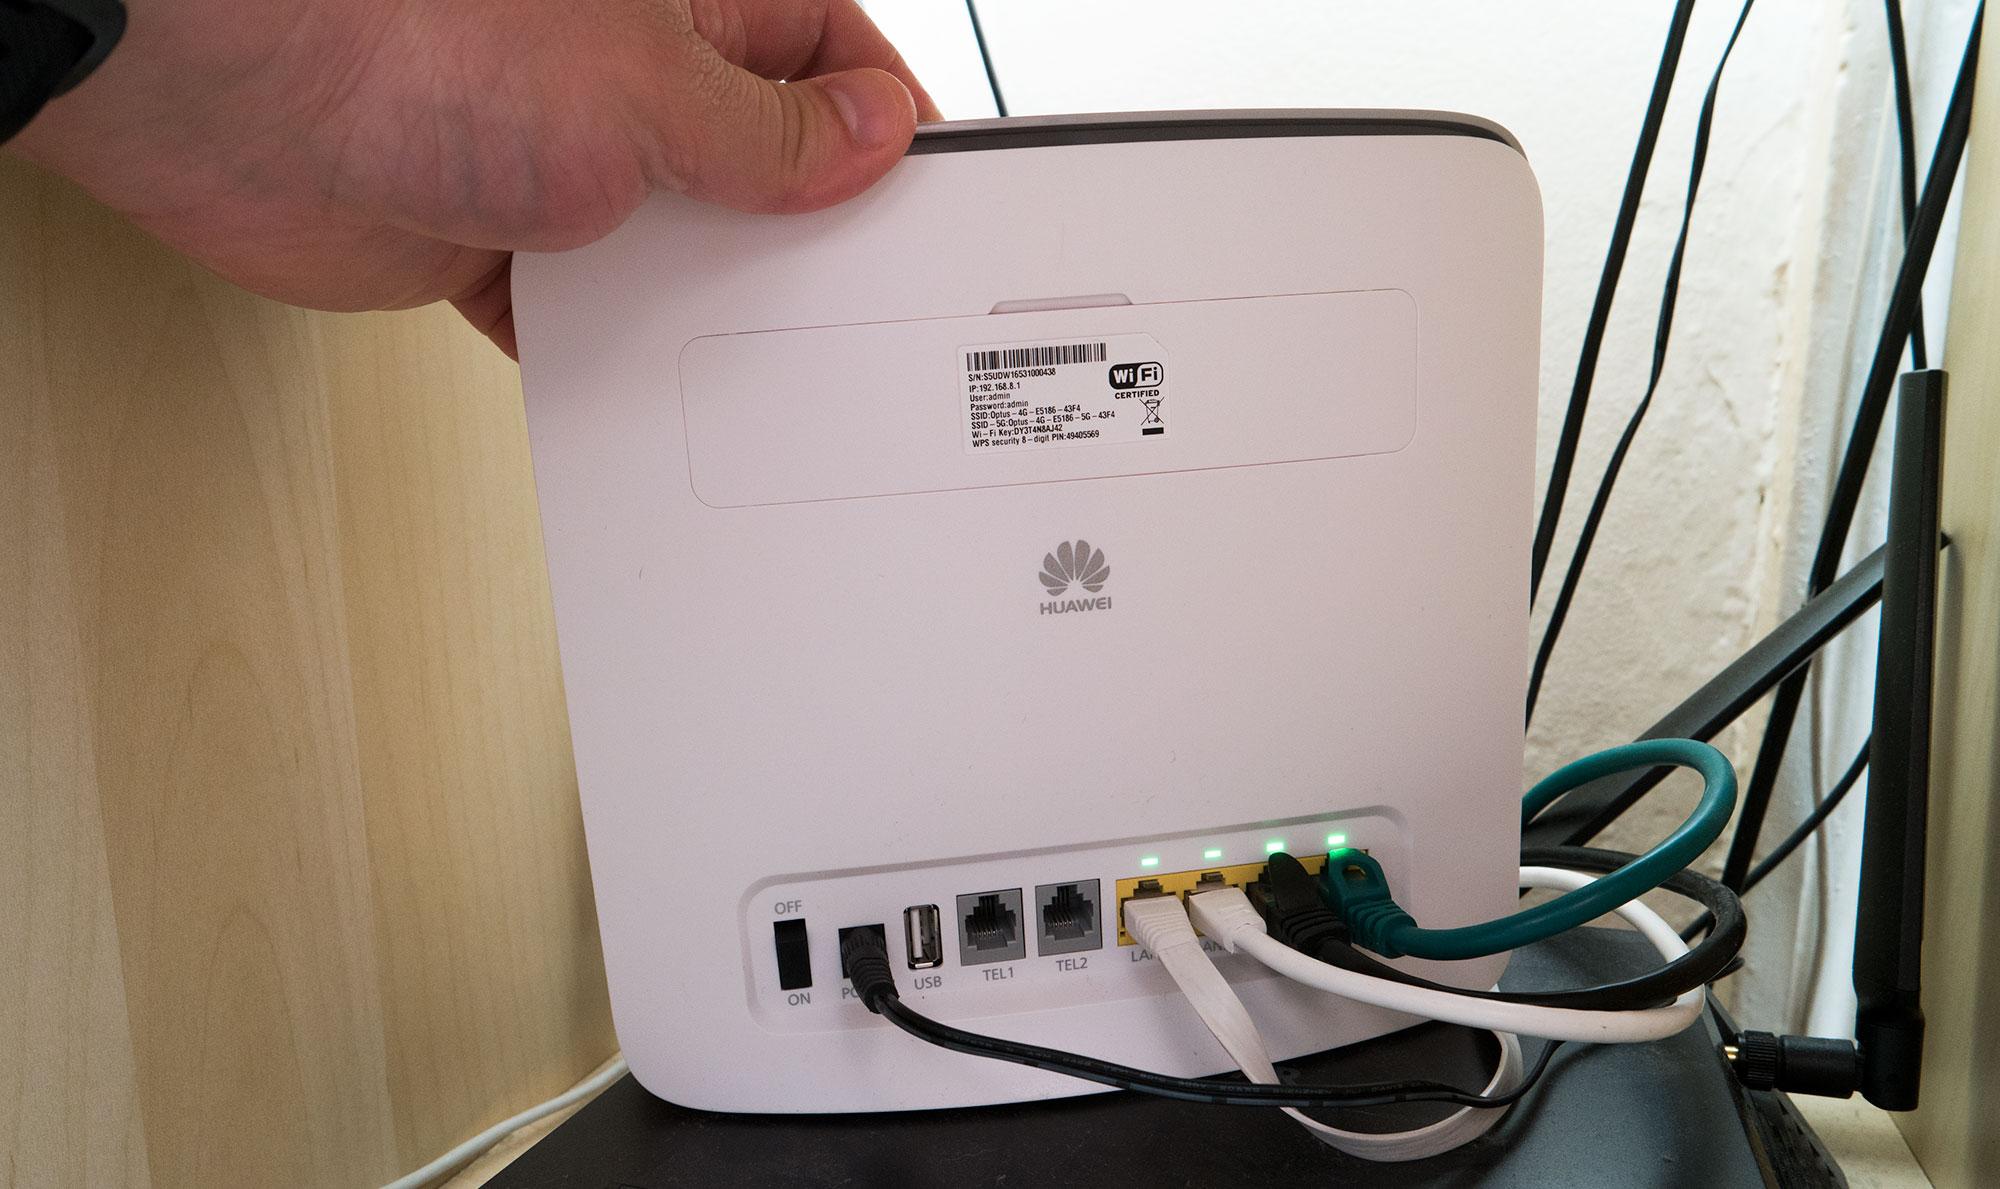 Review: Optus Home Wireless Broadband